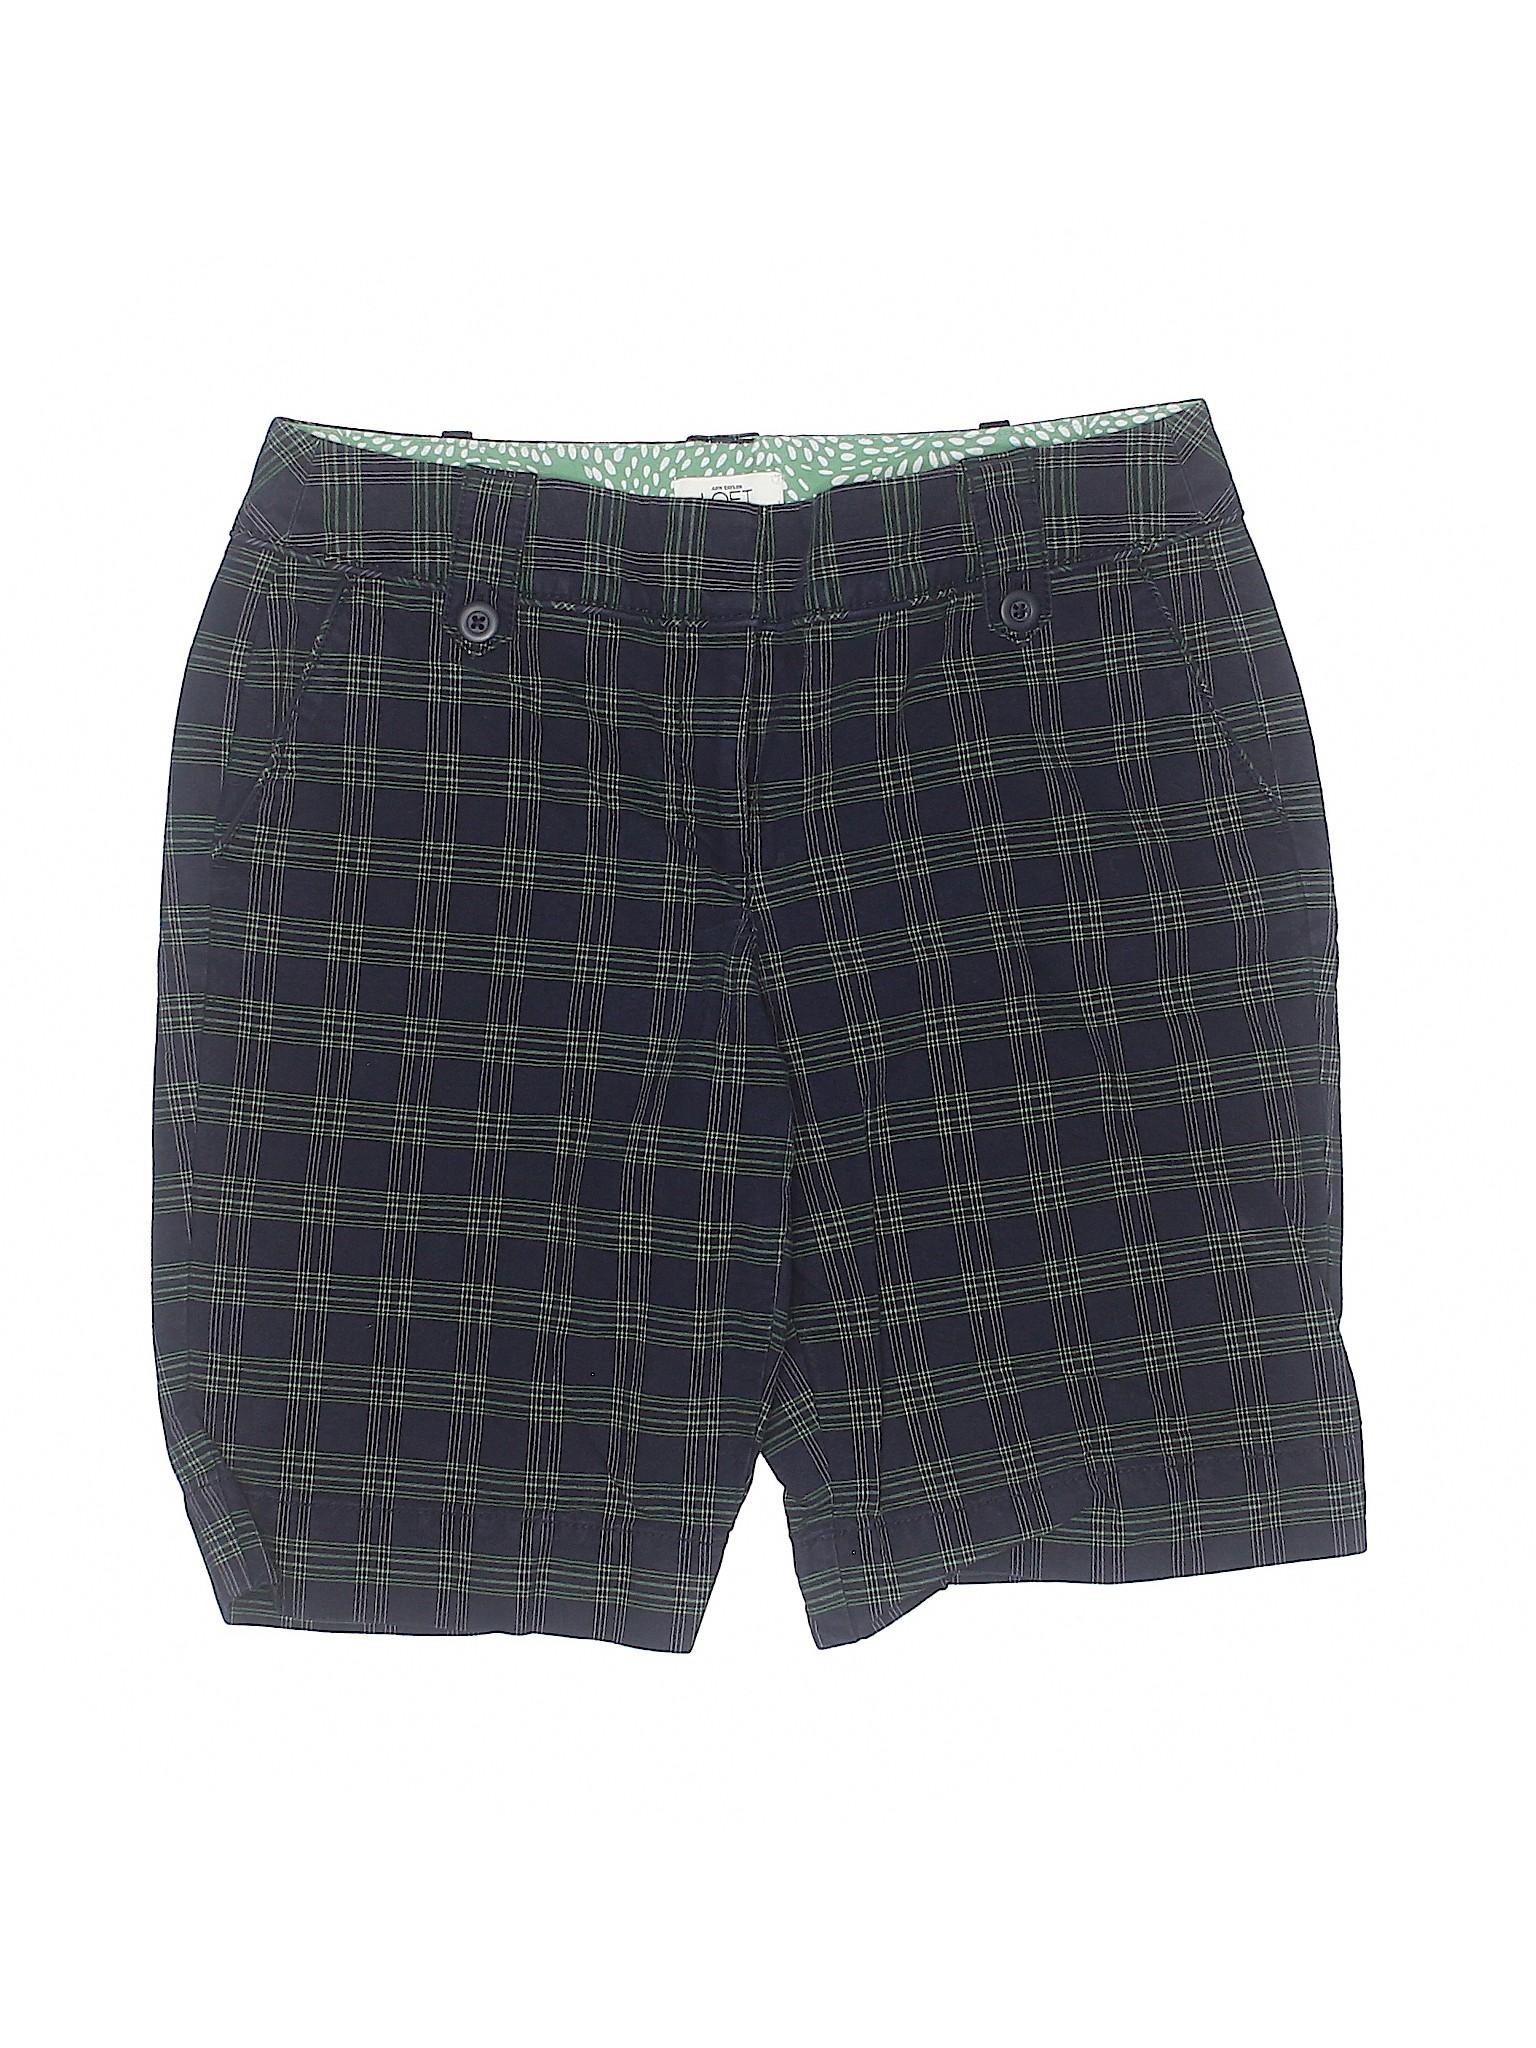 Boutique LOFT Taylor Shorts Khaki Ann ww6Aq4T